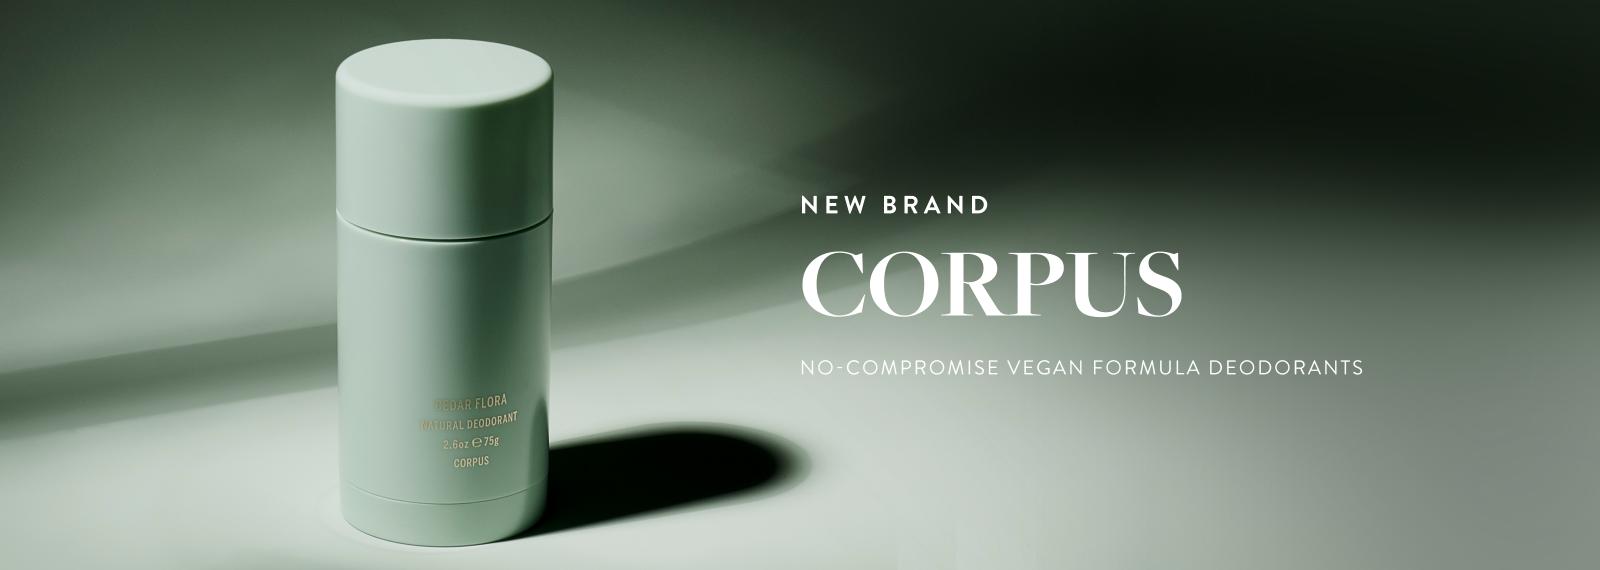 NEW BRAND - CORPUS